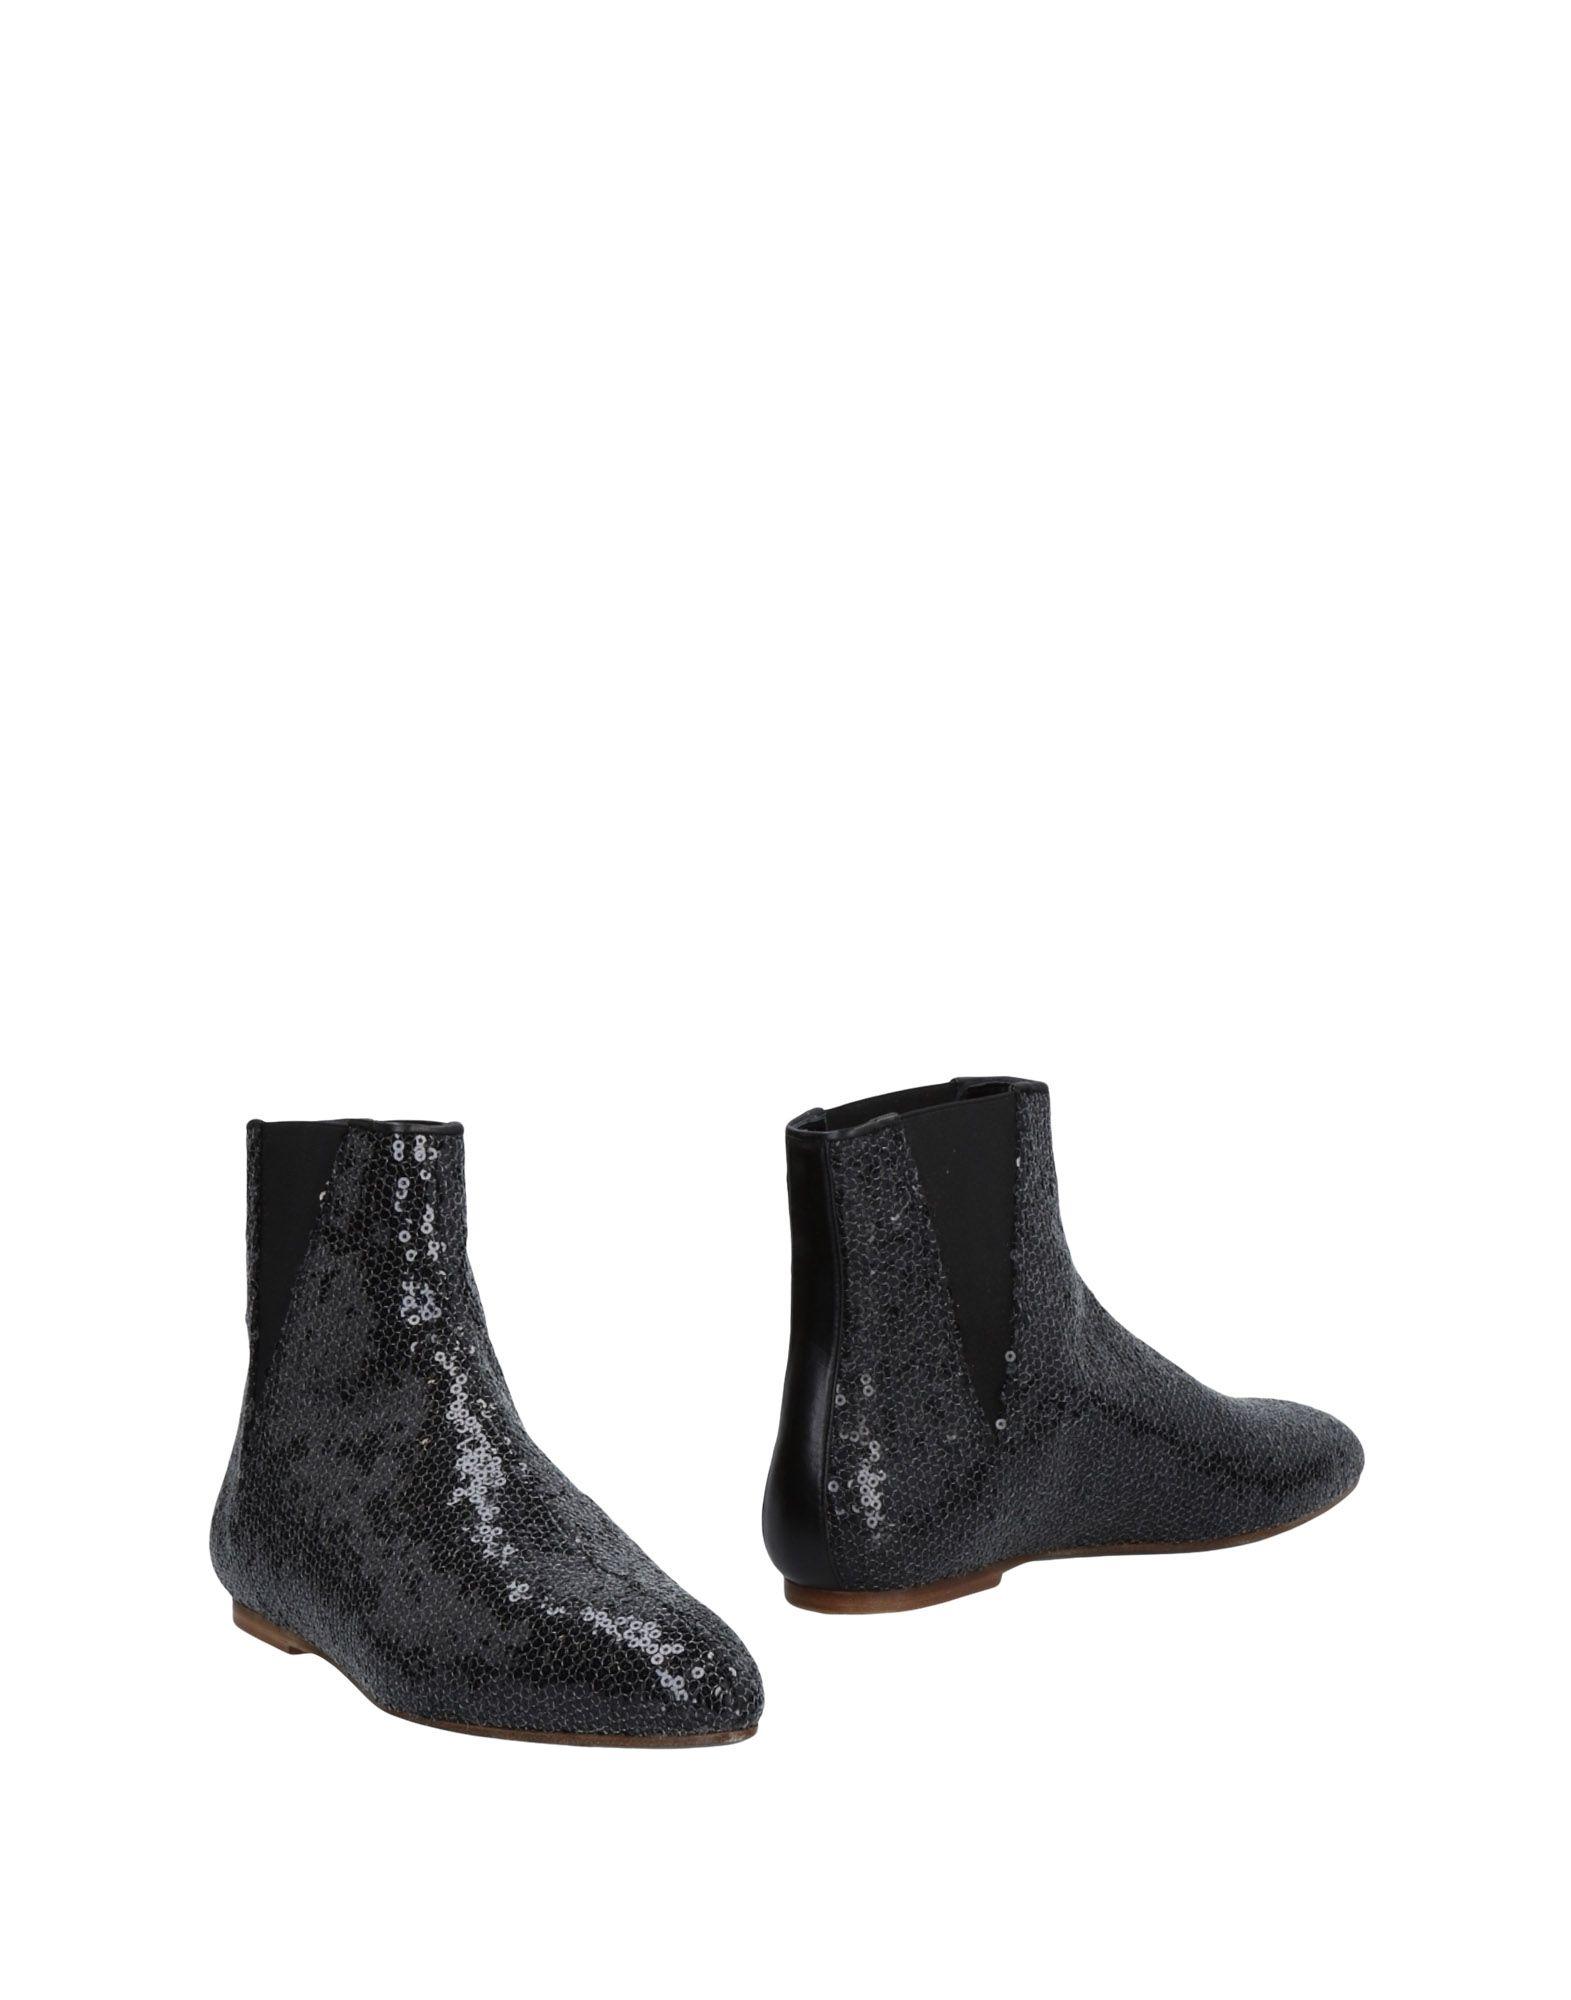 Rabatt Schuhe Loewe Stiefelette Damen  11459129IM